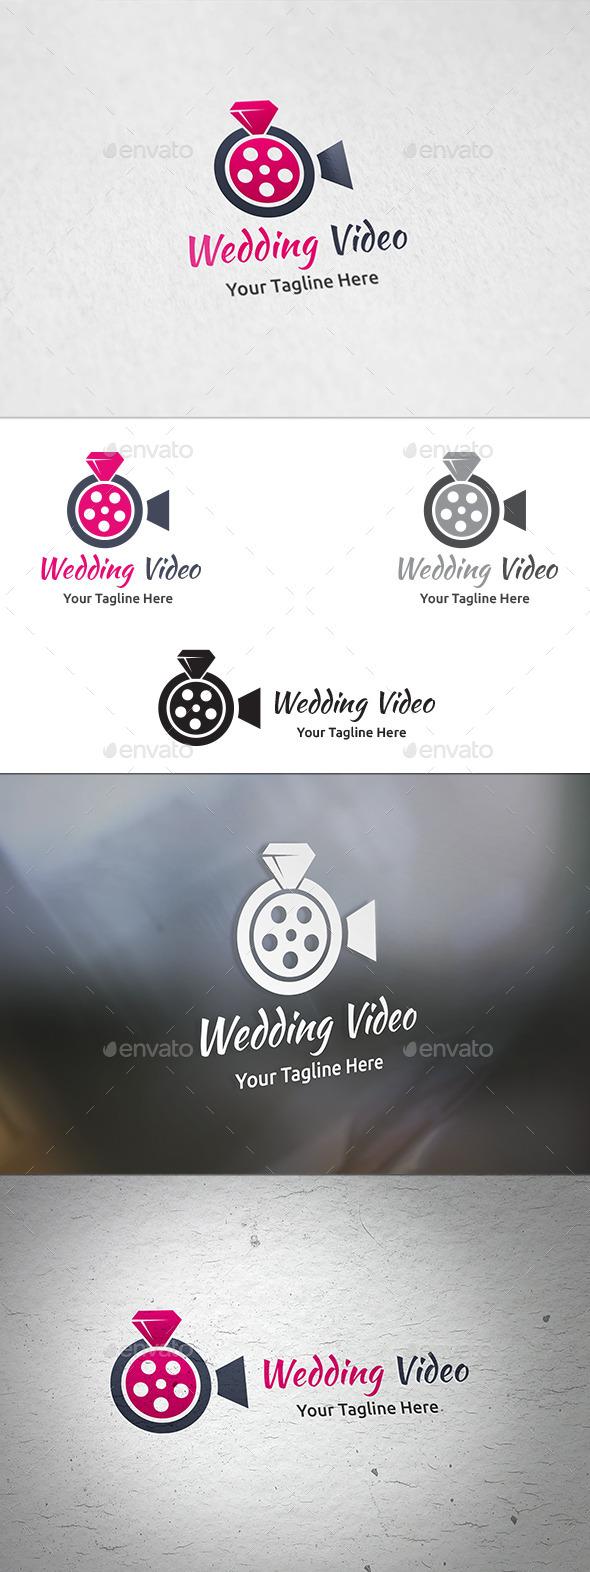 Wedding Video - Logo Template